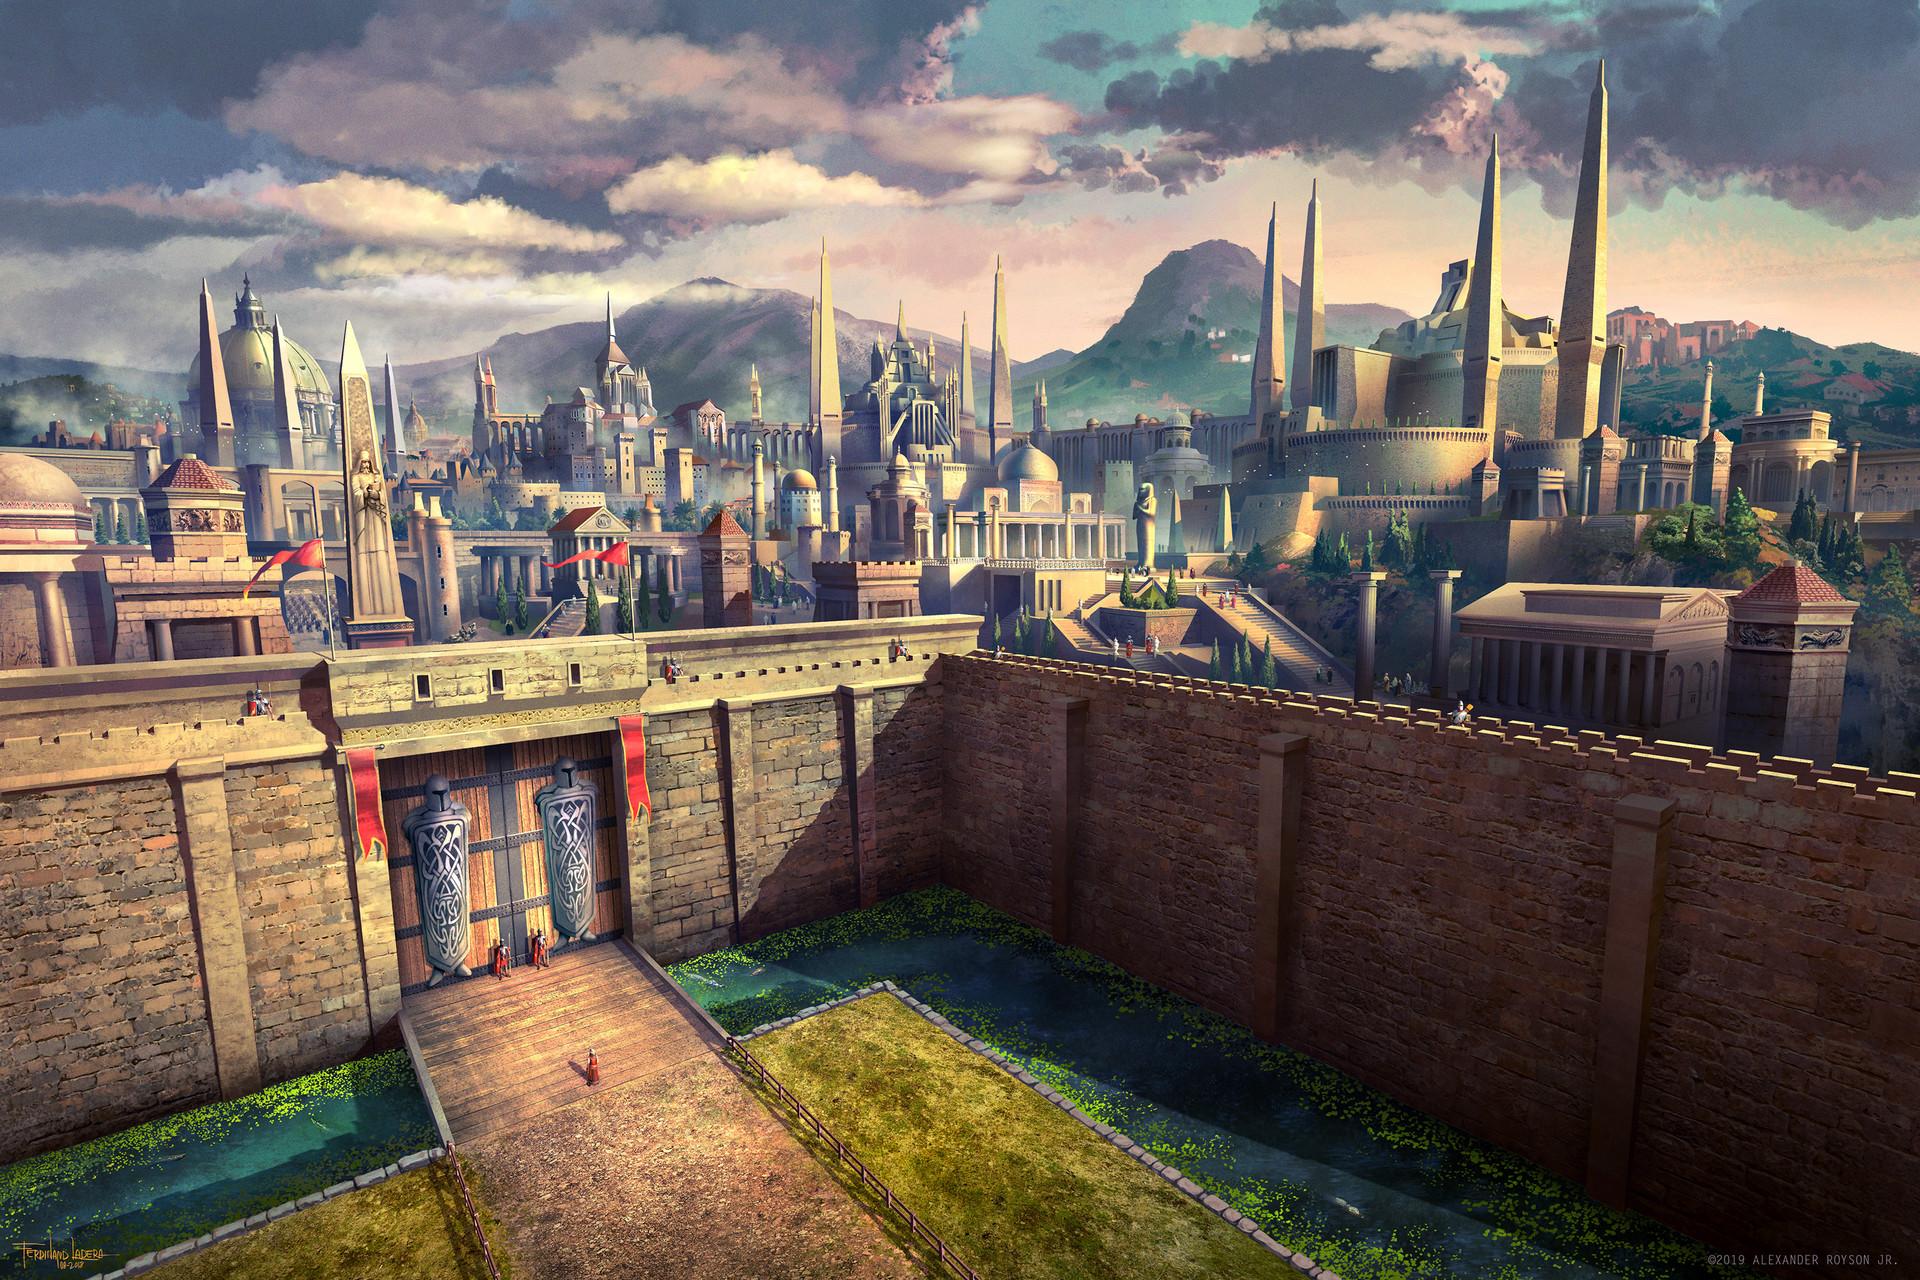 Ferdinand ladera gath the ancient city